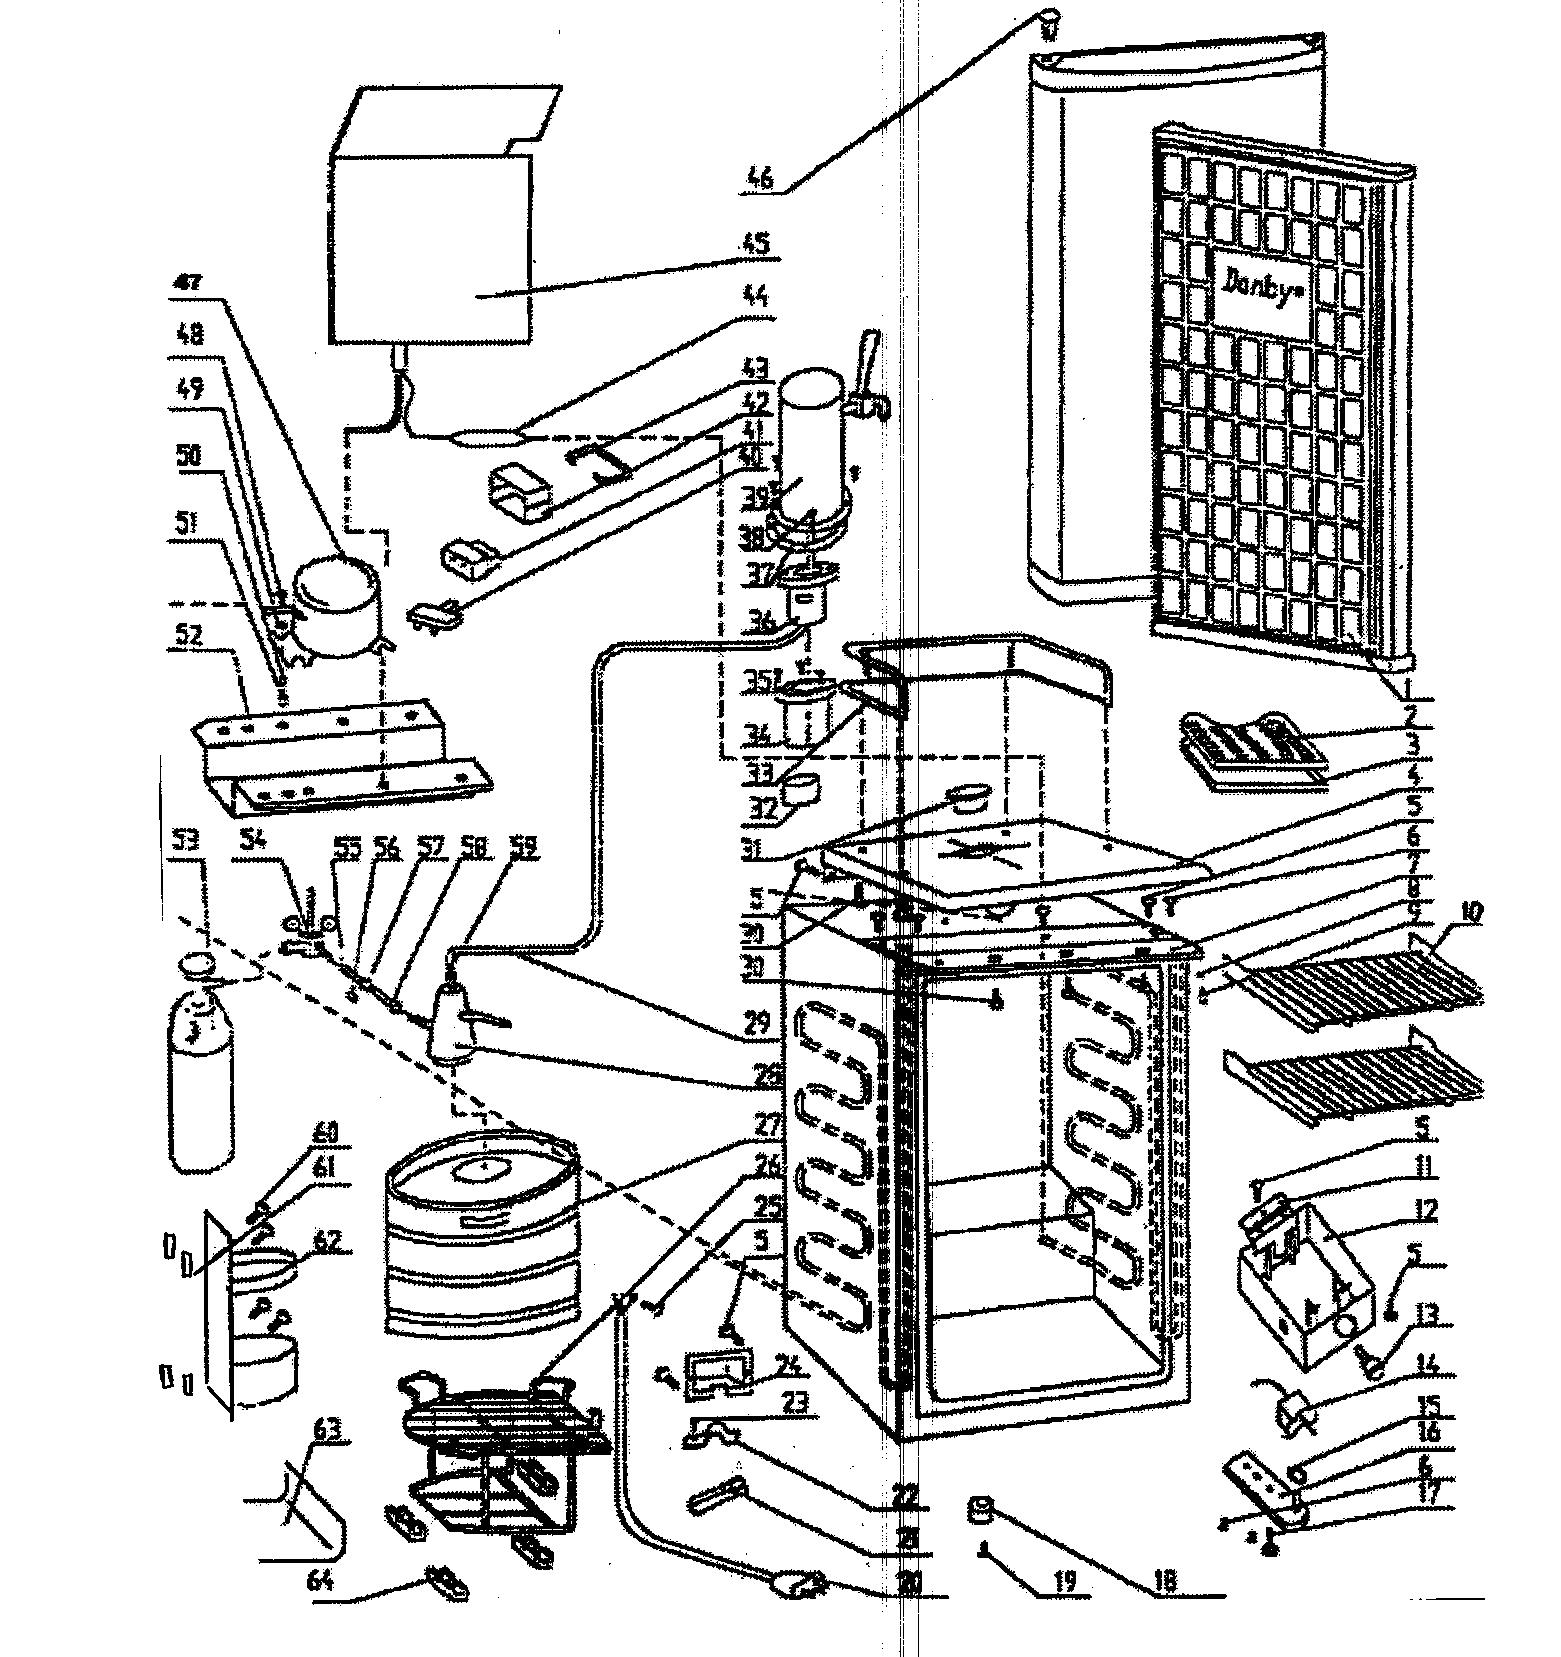 Kegerator parts diagram on walk in cooler wiring diagram defrost timer 303030